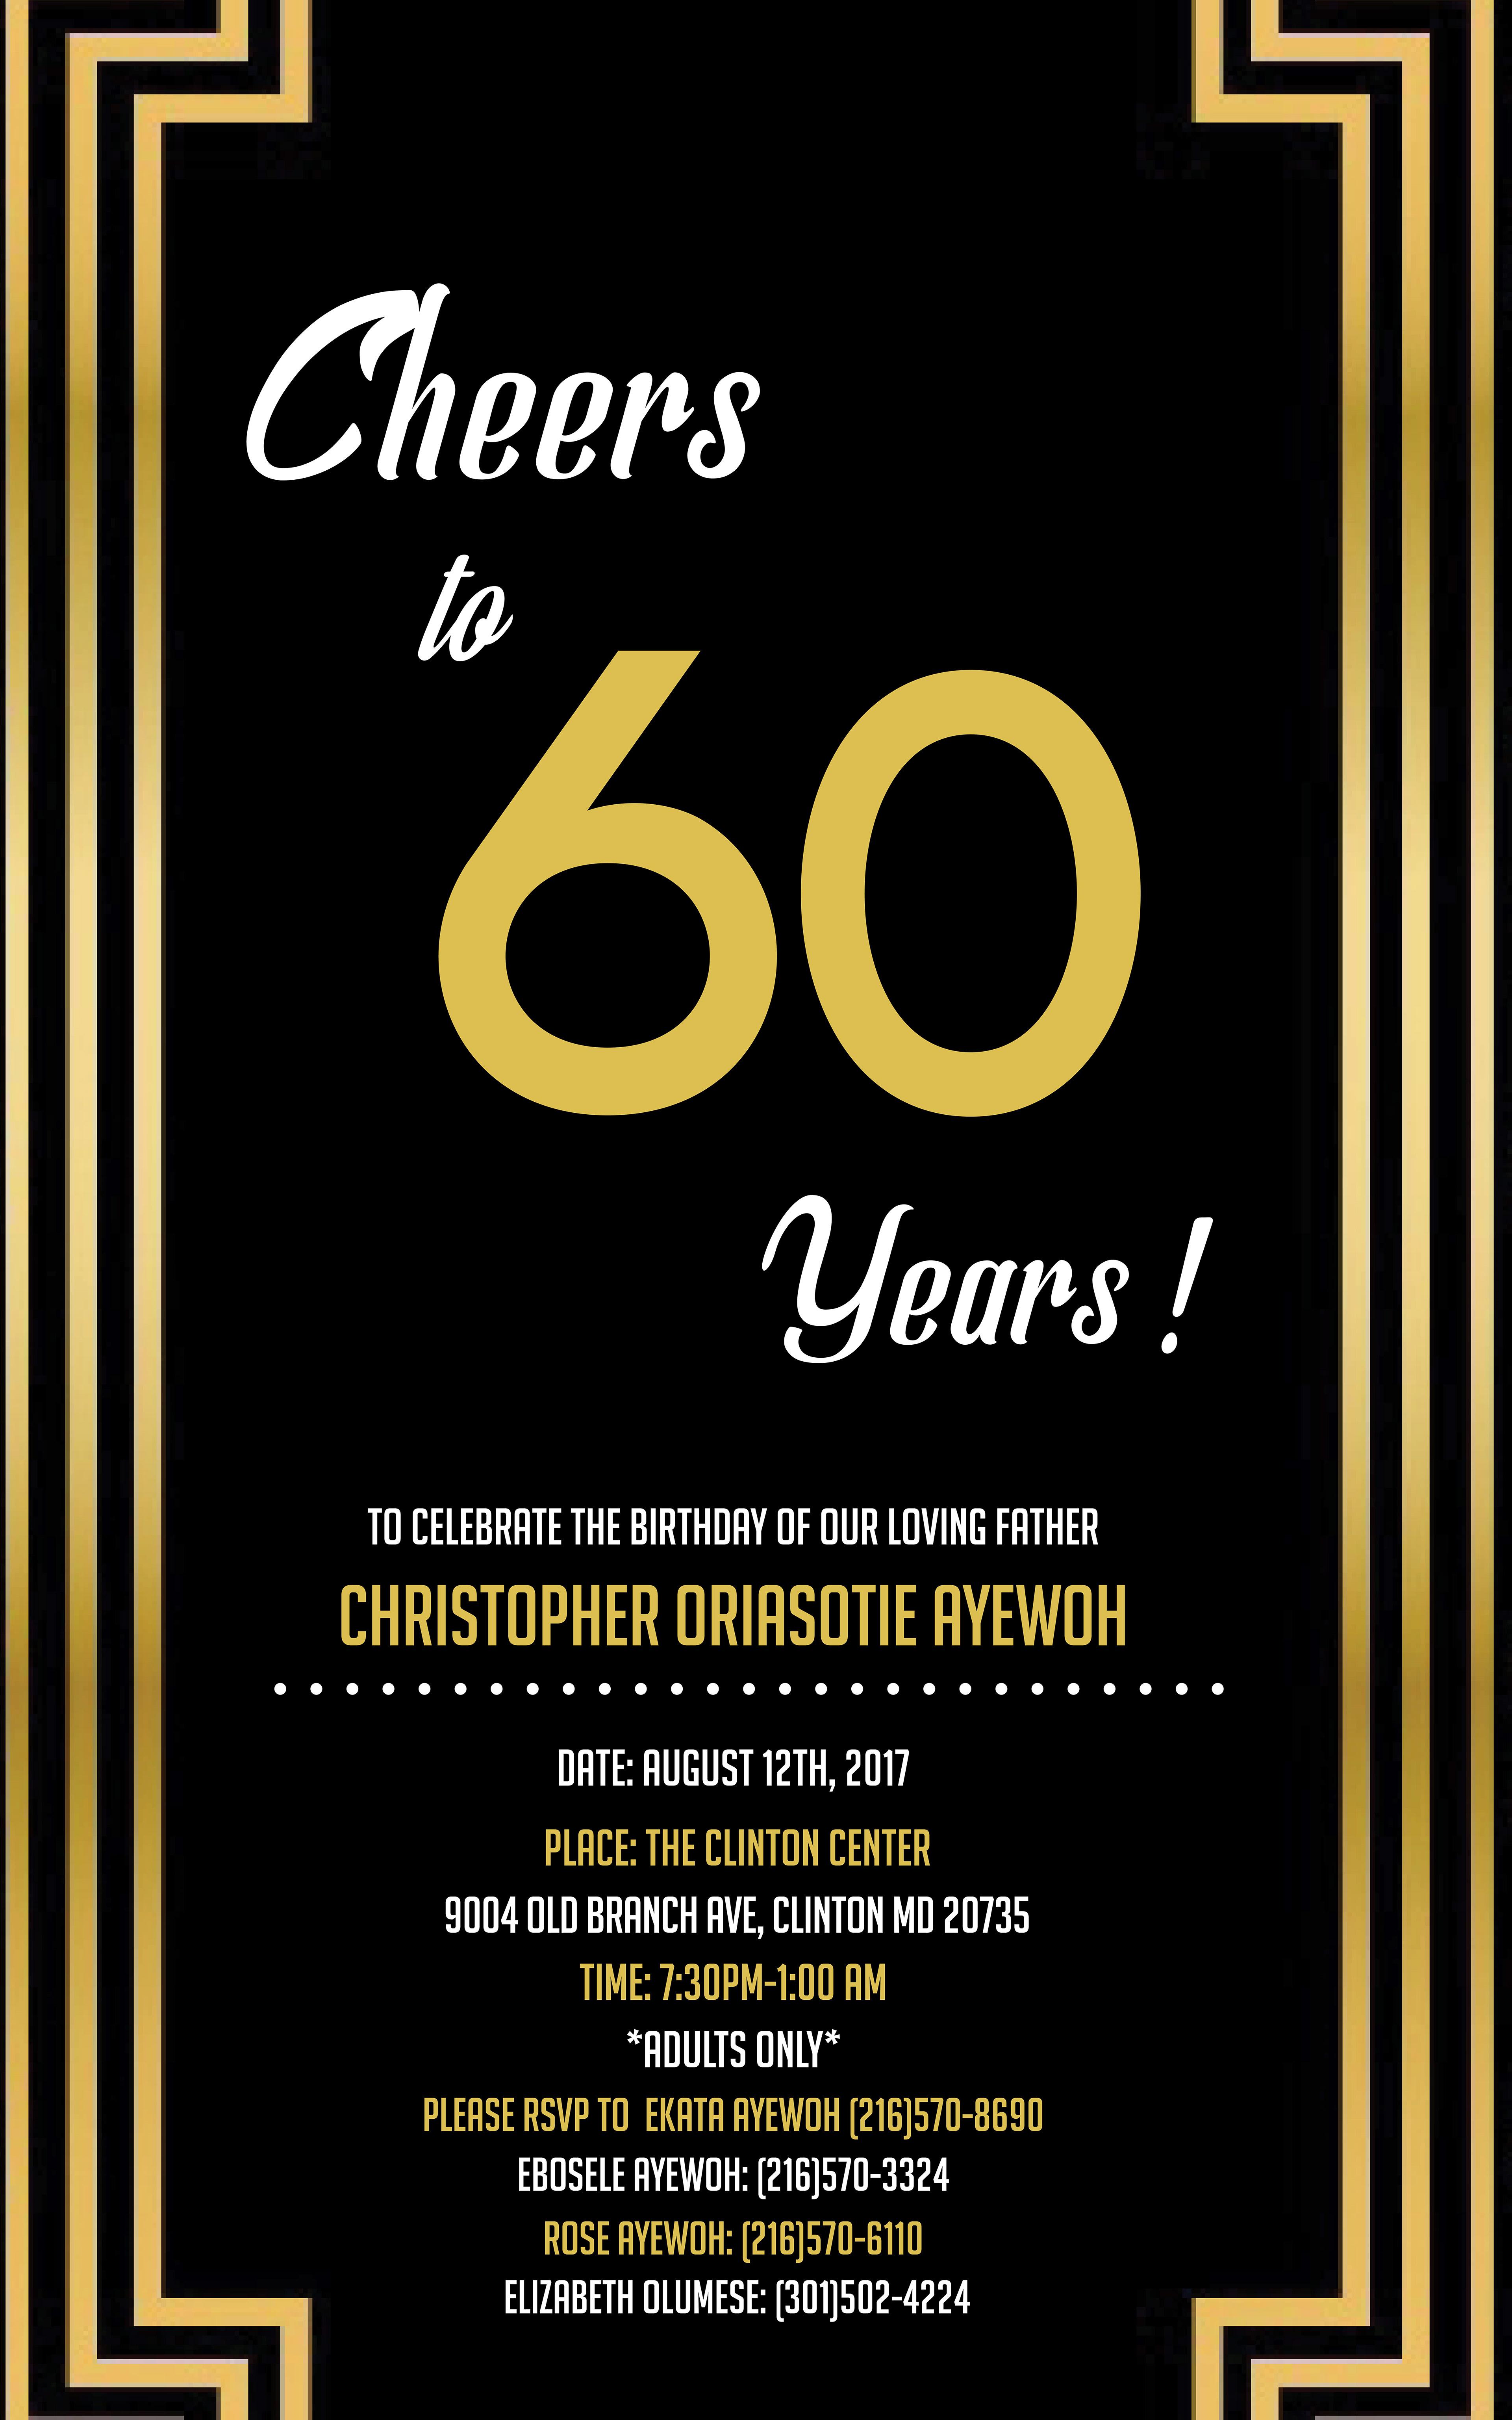 Taylor gregory 60th birthday invitation 60th birthday invitation filmwisefo